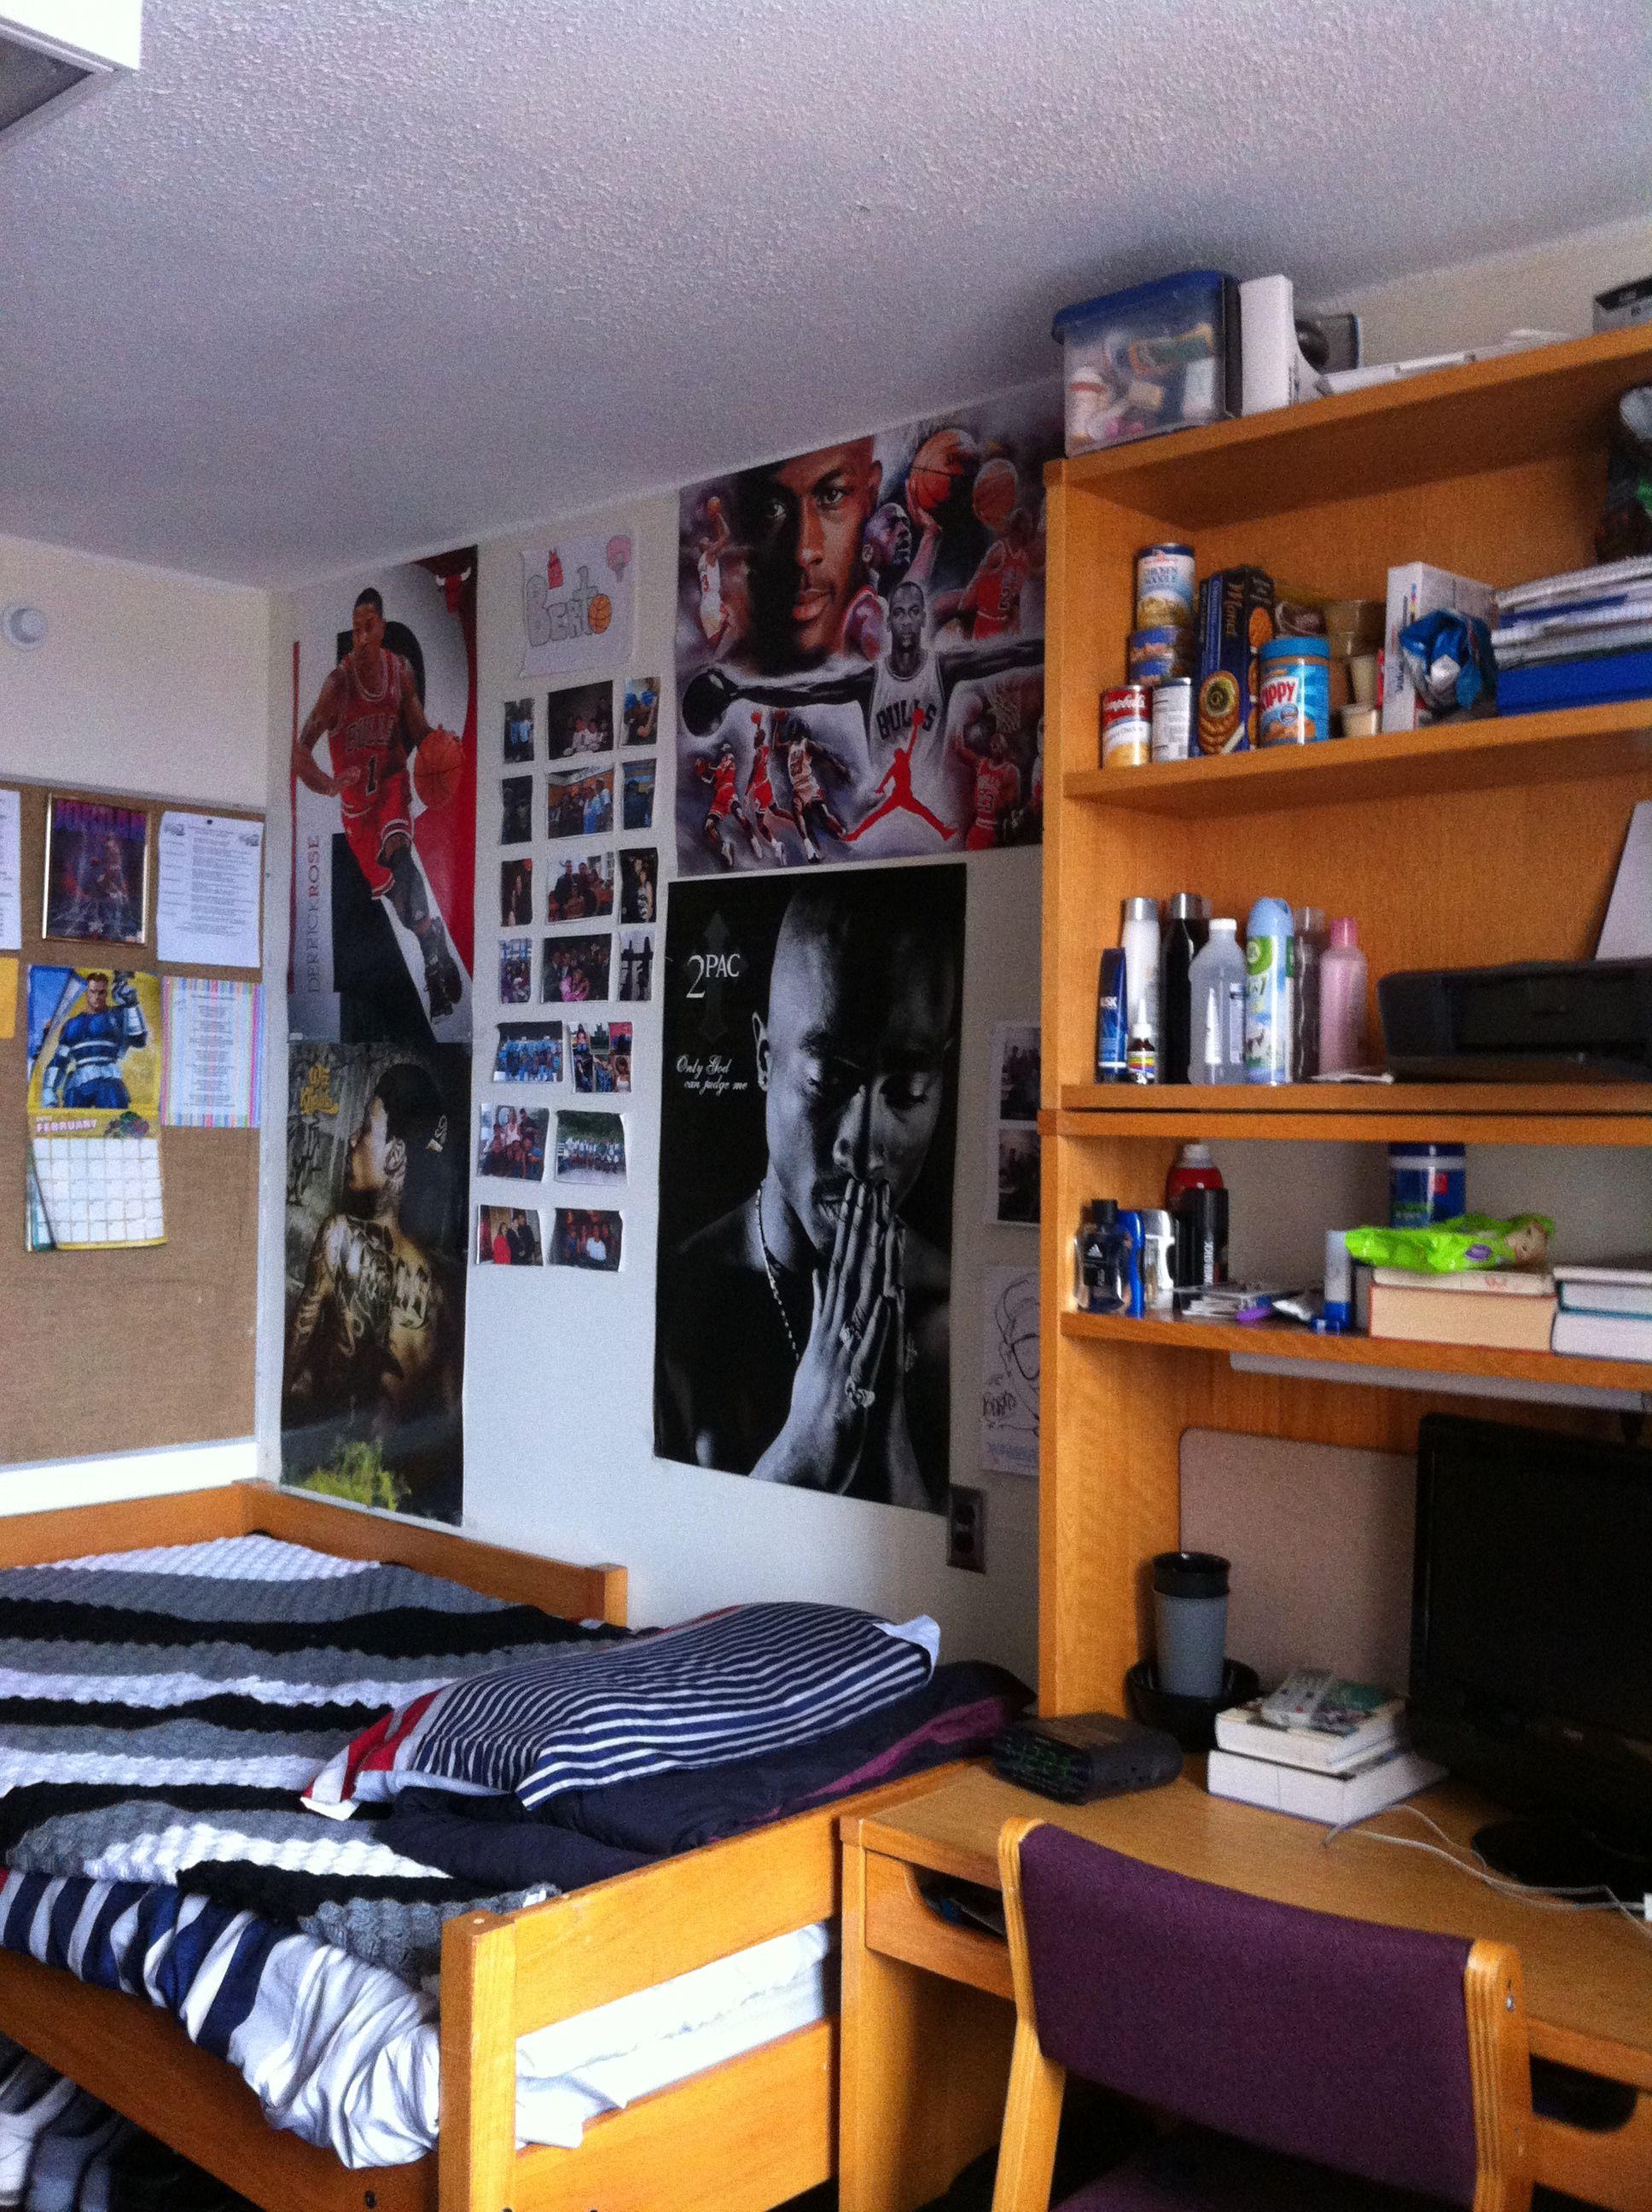 """My room, Family photos , D.rose, 2pac  "" - Alberto from Carman Hall"